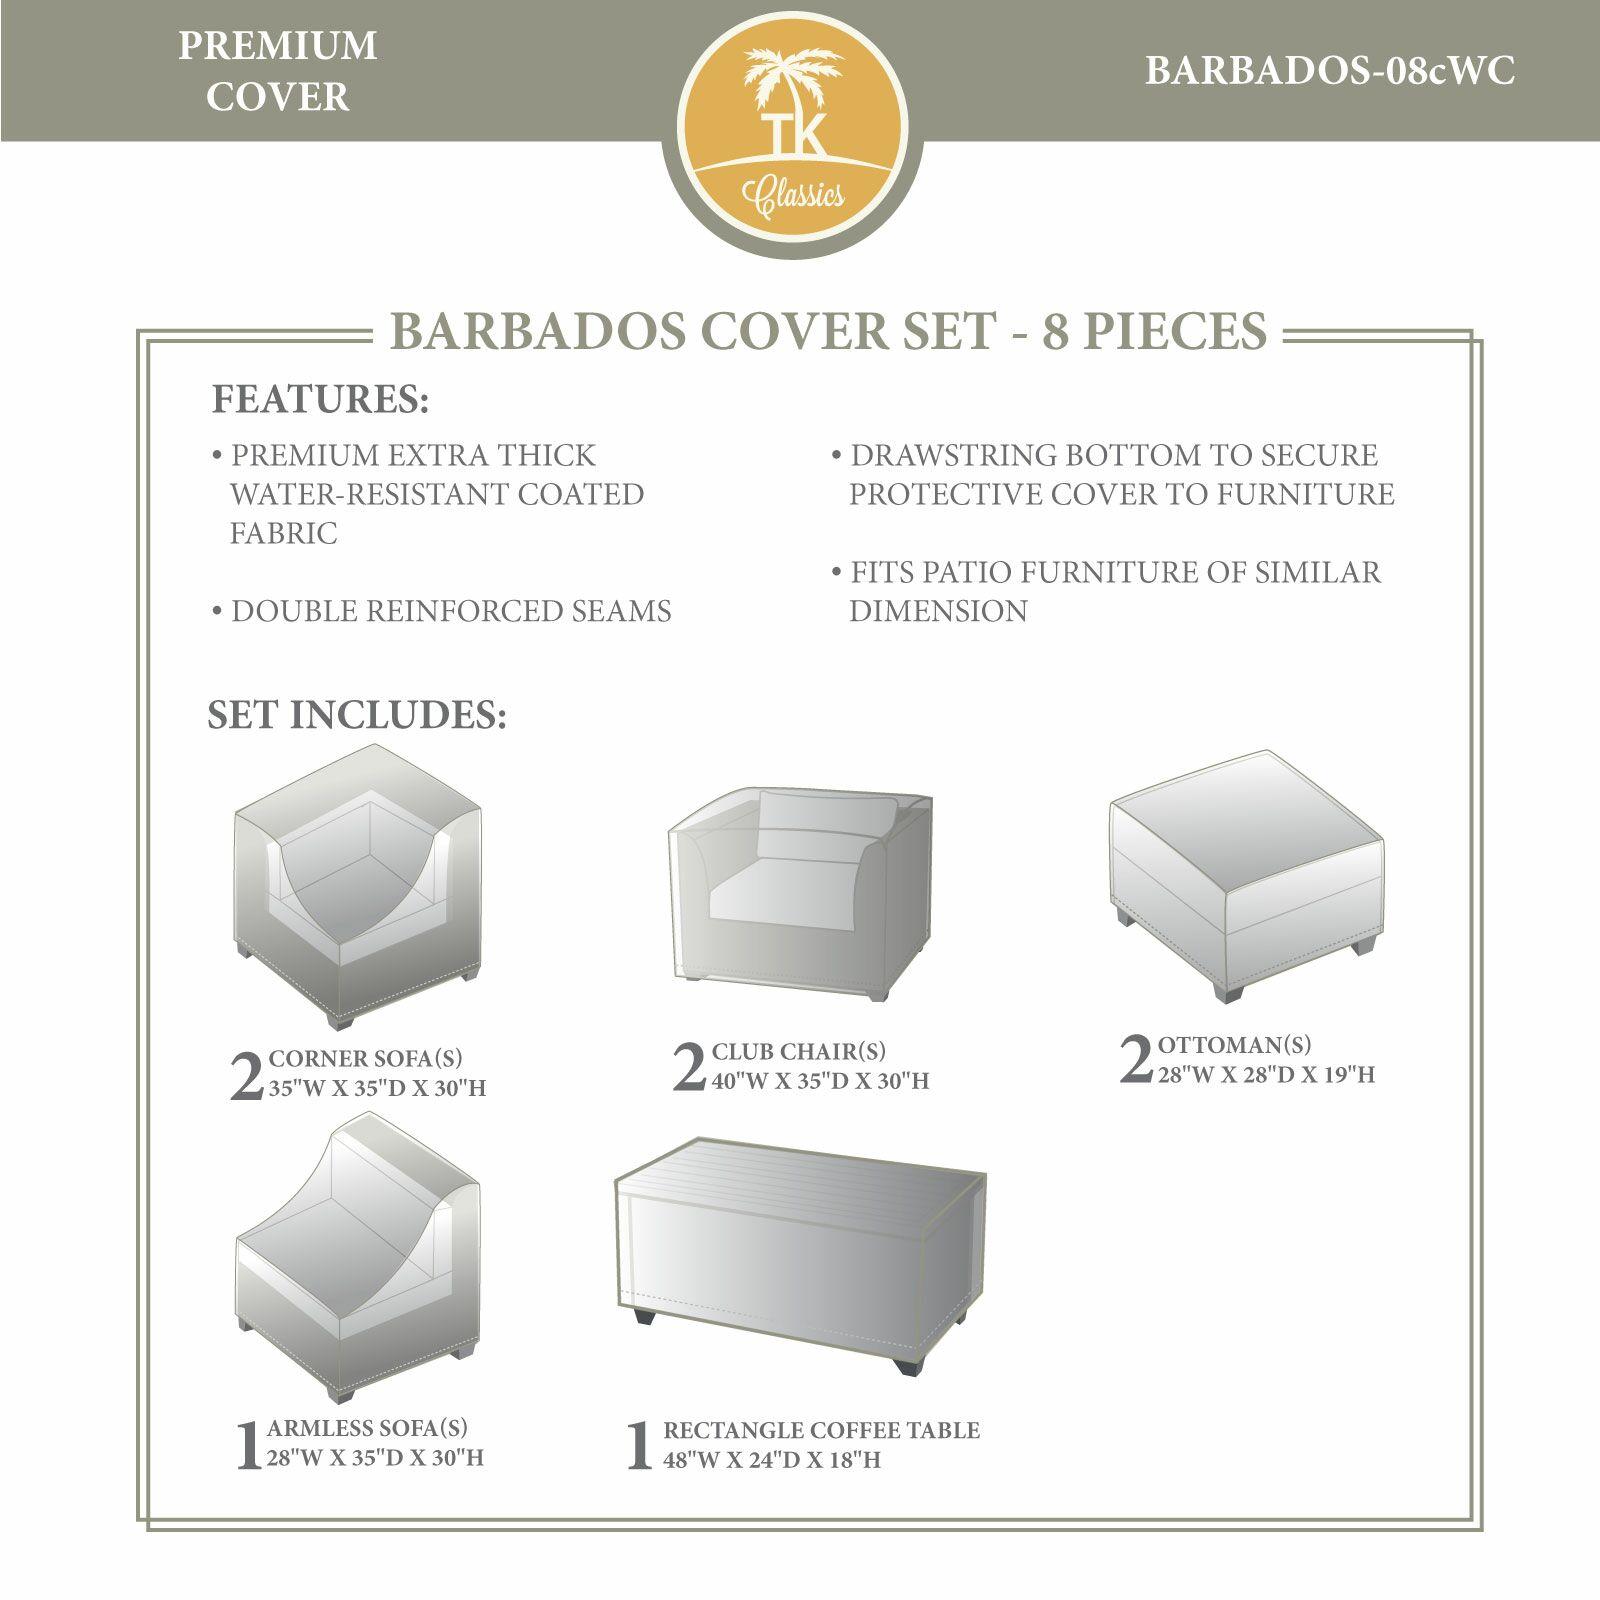 Barbados Winter 8 Piece Cover Set